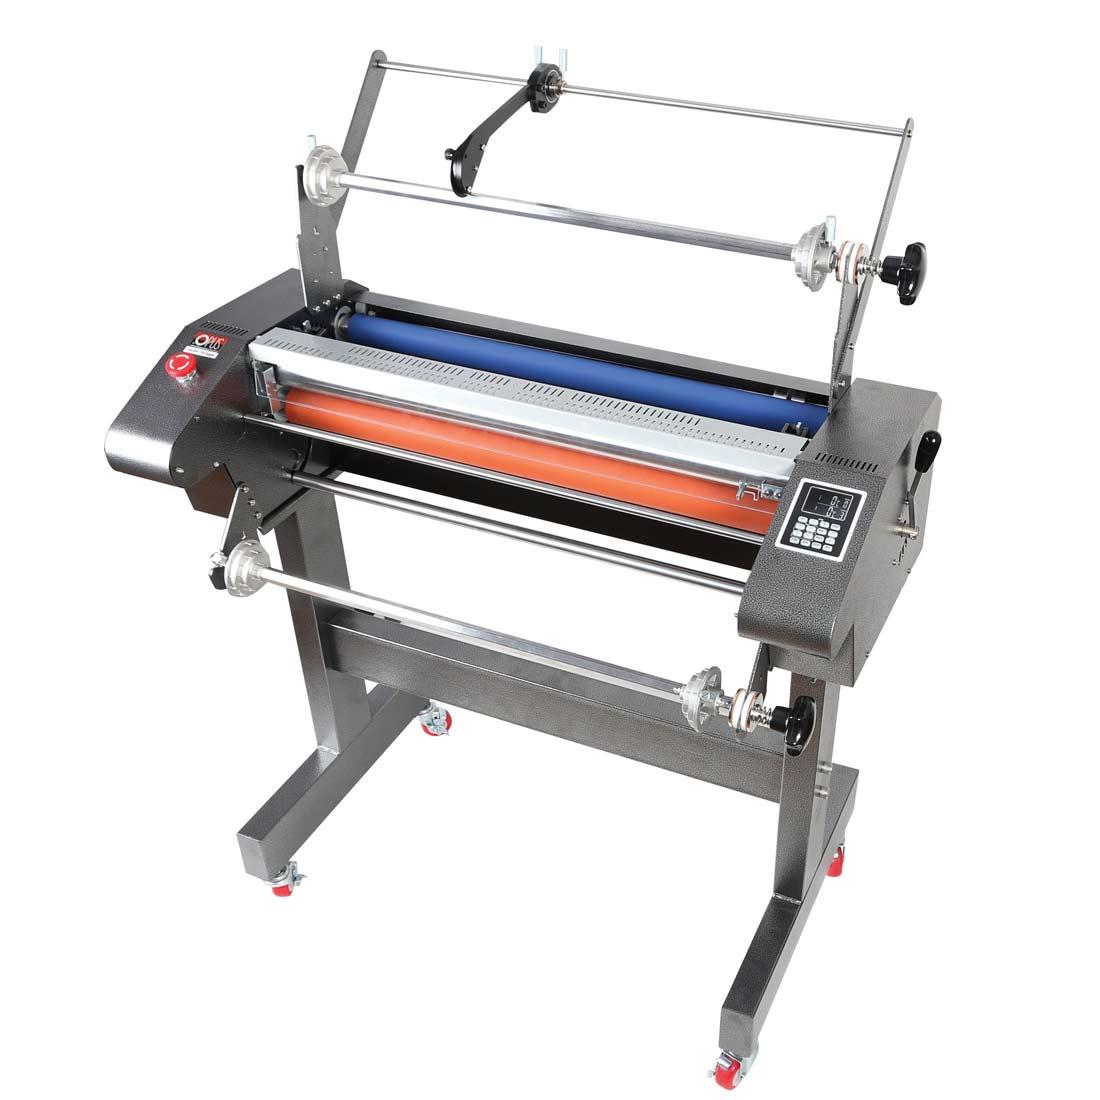 Profesjonalny laminator rolowy - OPUS rolLAM 720 Super